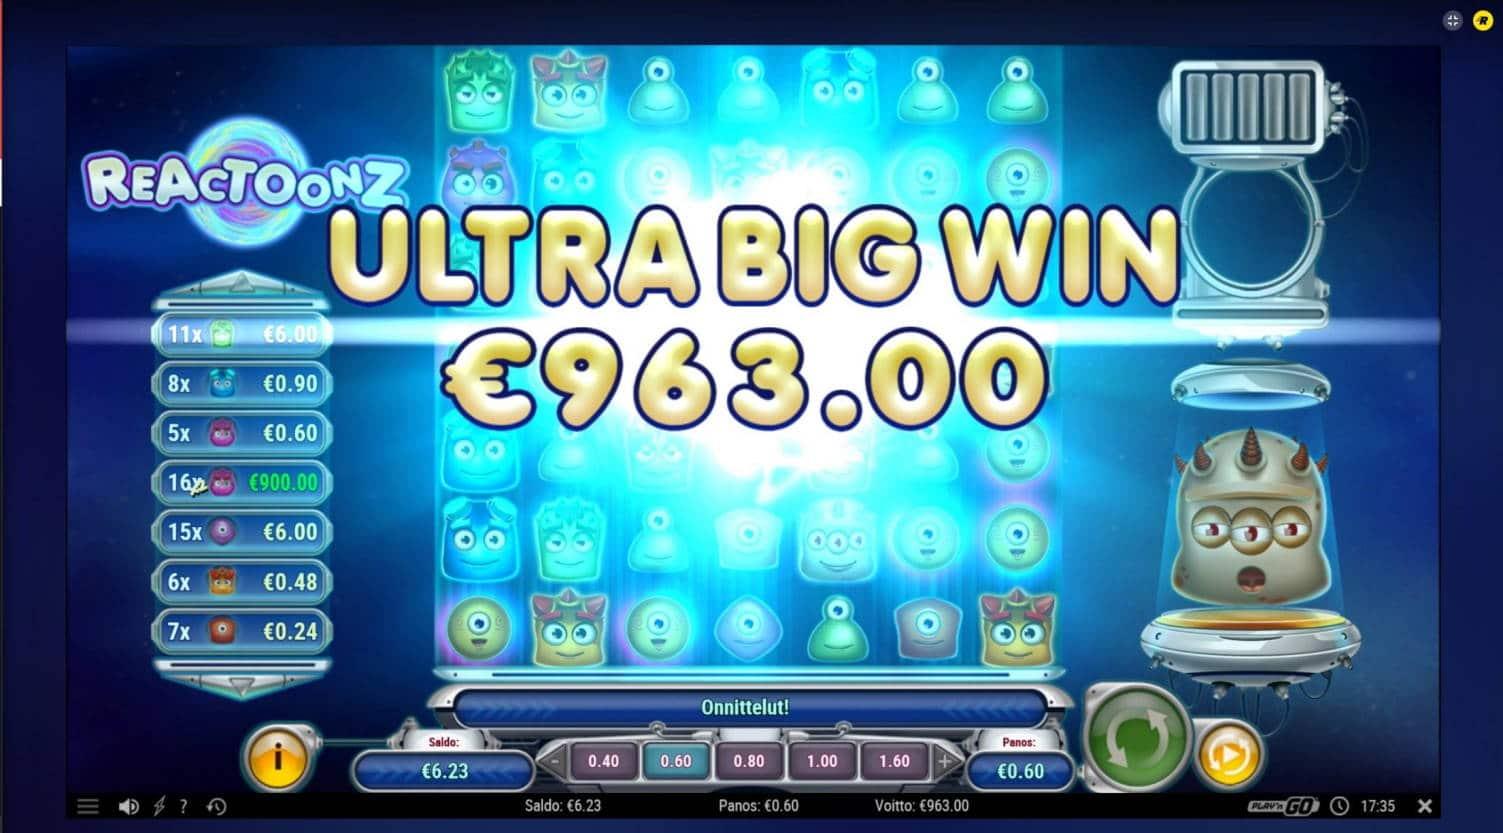 Reactoonz Casino win picture by carl 16.11.2020 963e 1605X